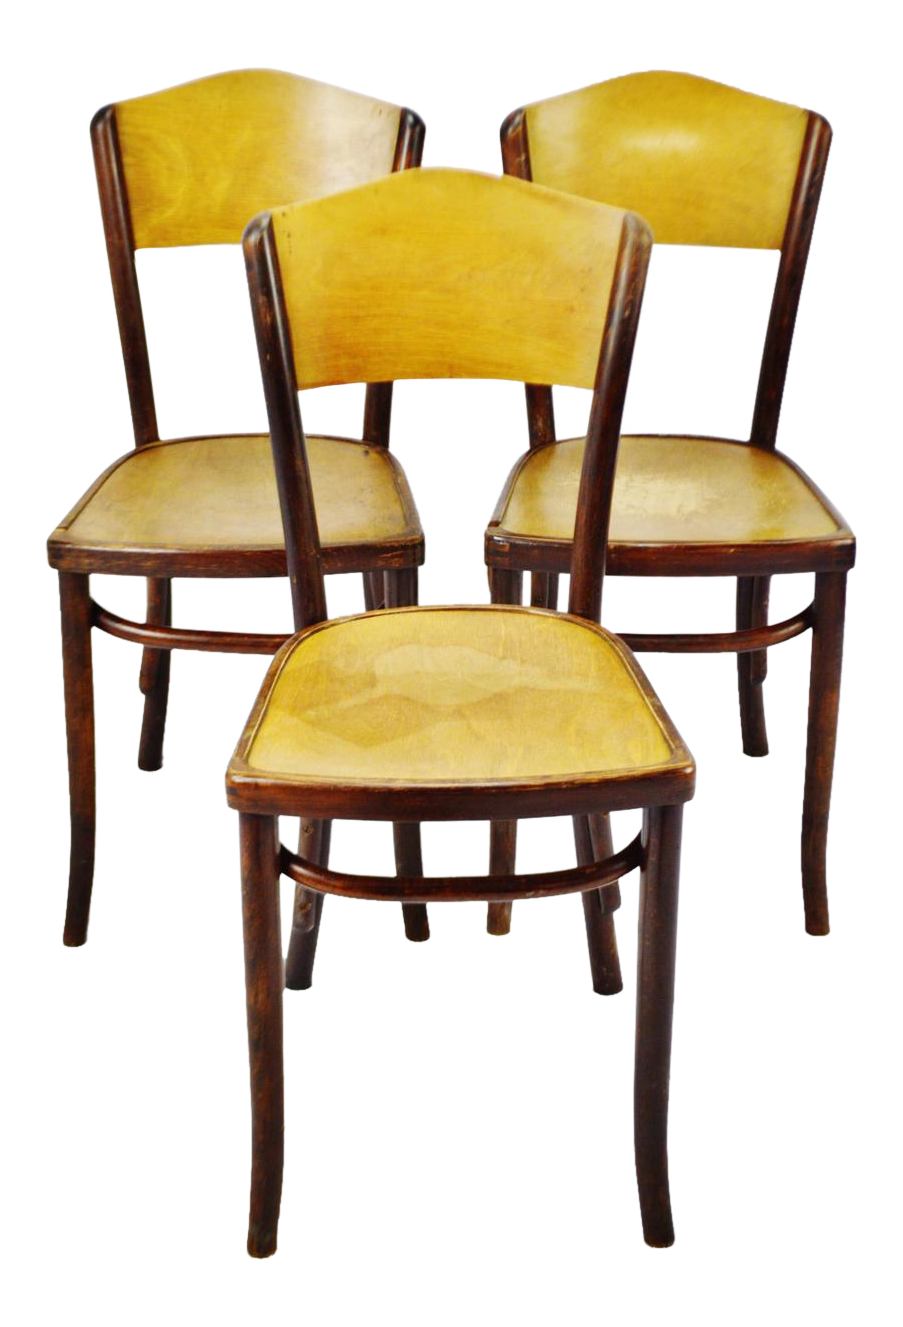 bentwood bistro chair. Bentwood Bistro Chair I